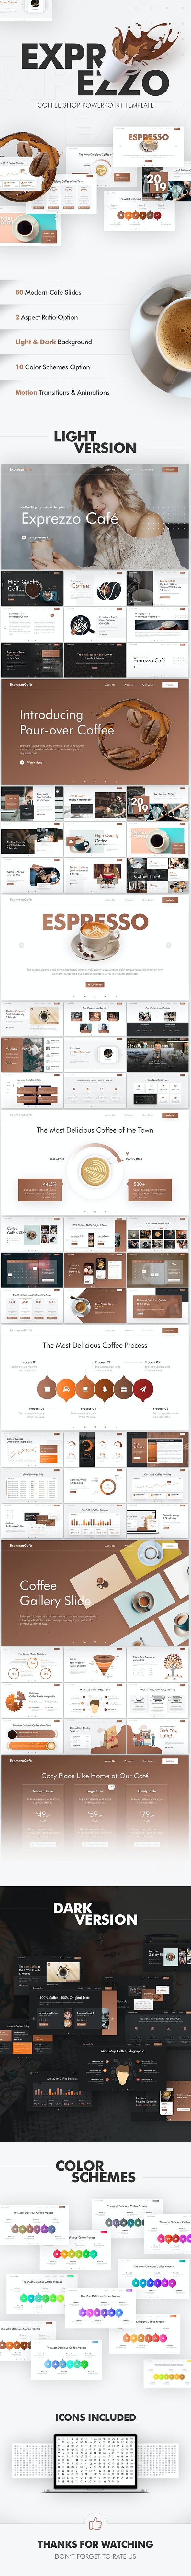 Exprezzo Cafe PowerPoint Template - PowerPoint Templates Presentation Templates